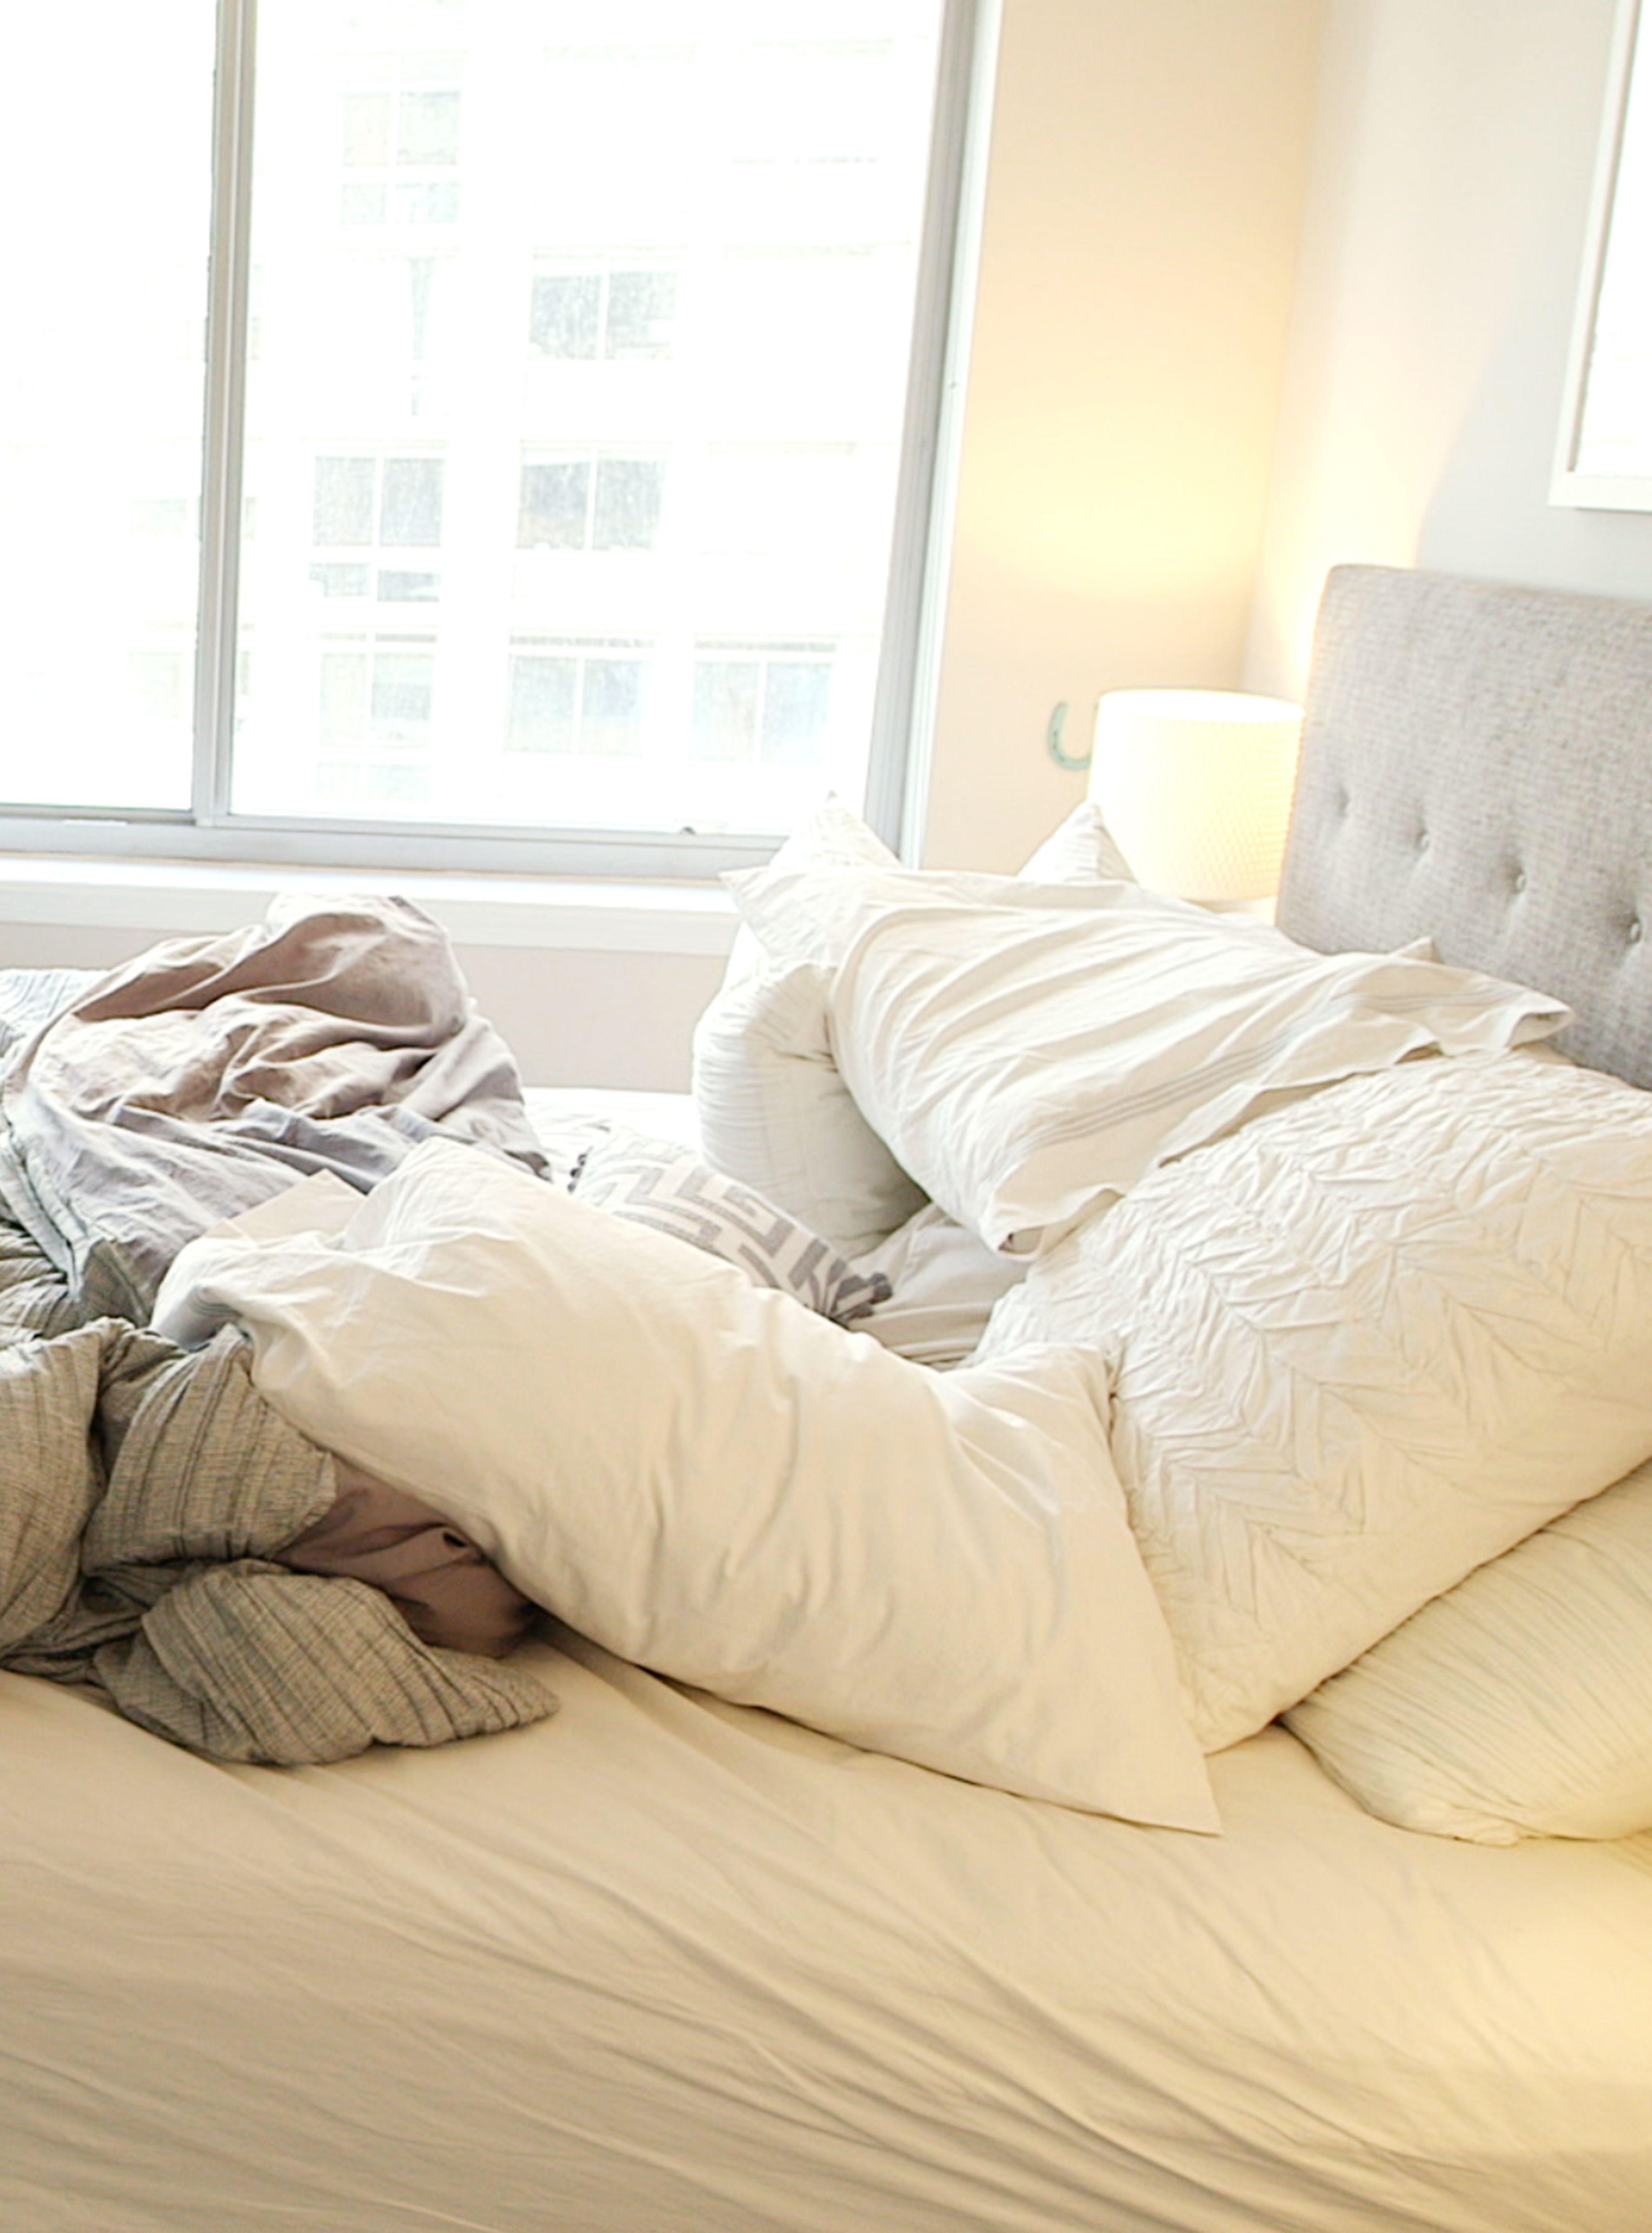 How I pletely Redesigned My Bedroom In e Day